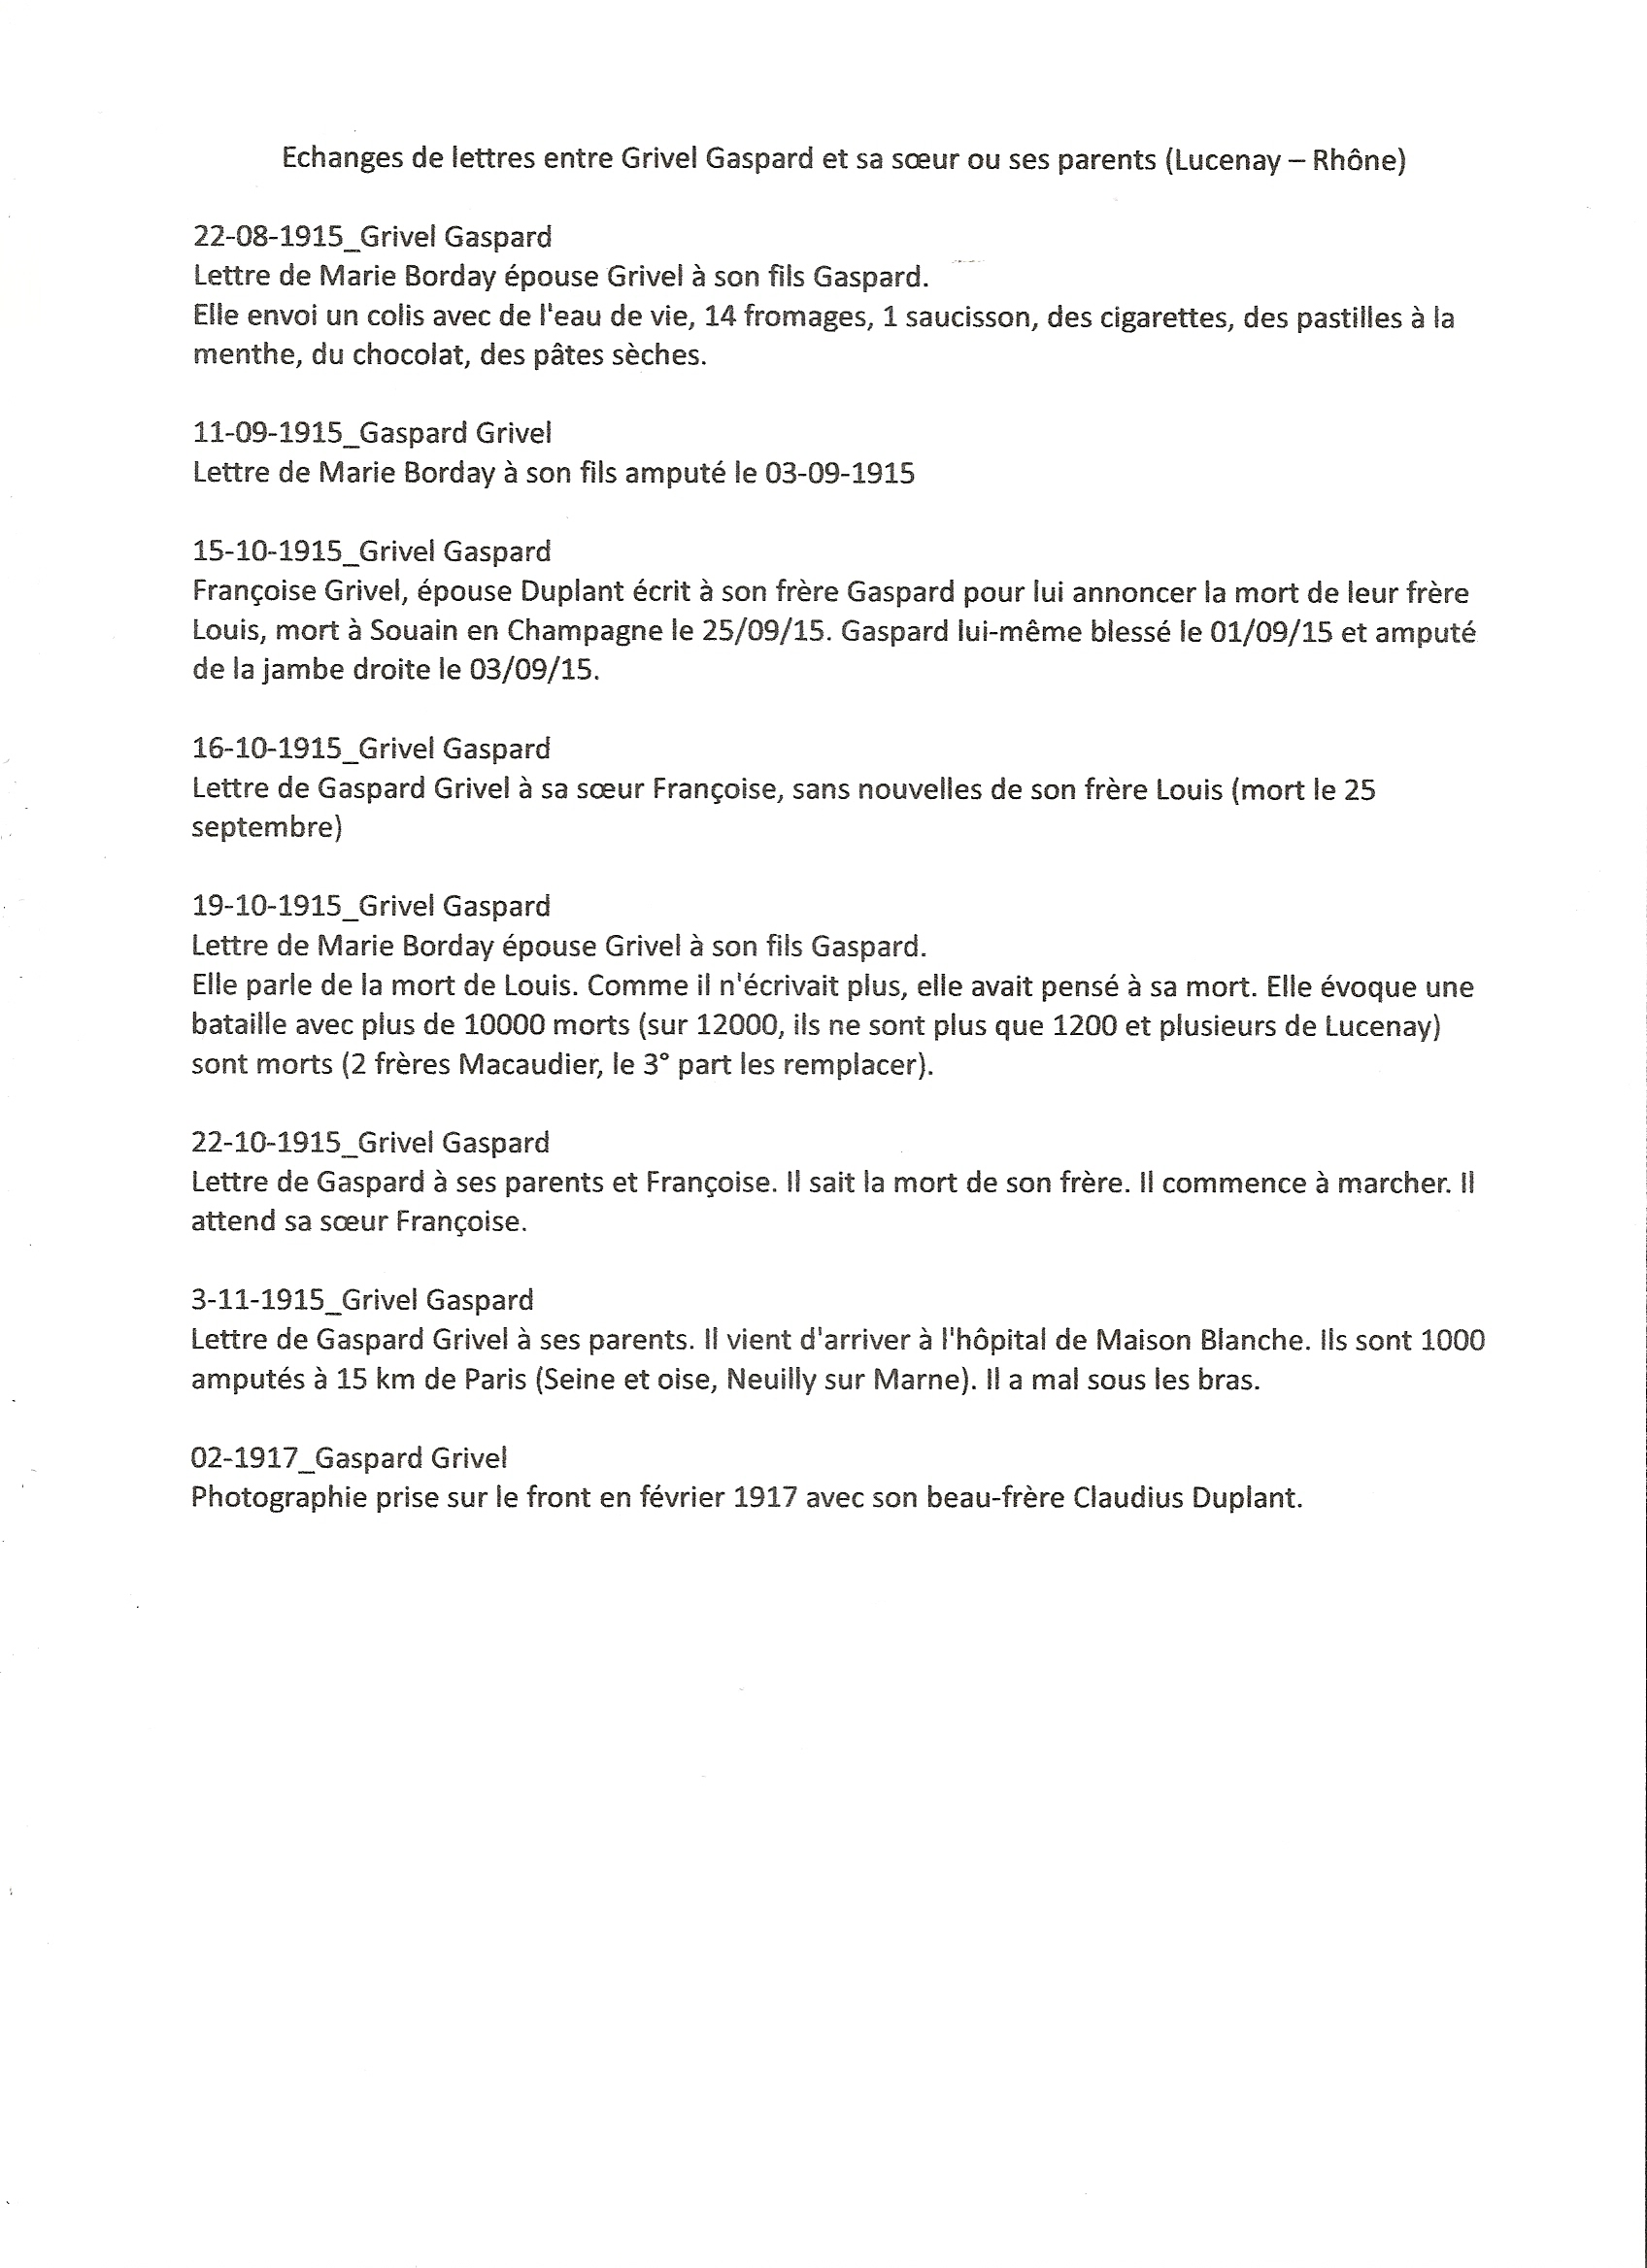 La Vie Du Soldat Gaspard Grivel Item 38 Transcribathon